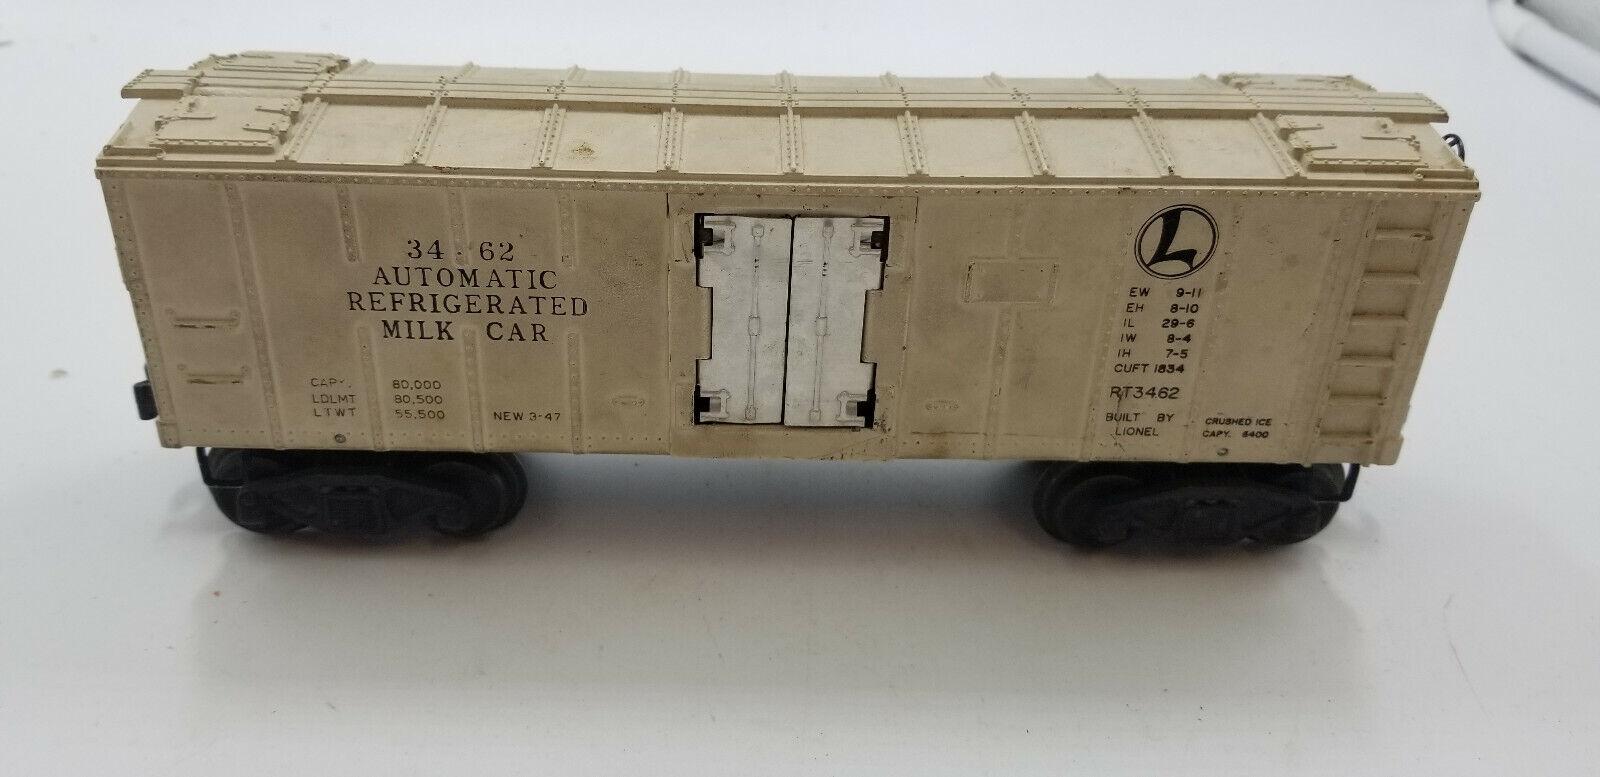 Lionel Trains Milk Car No. 3462 & Platform